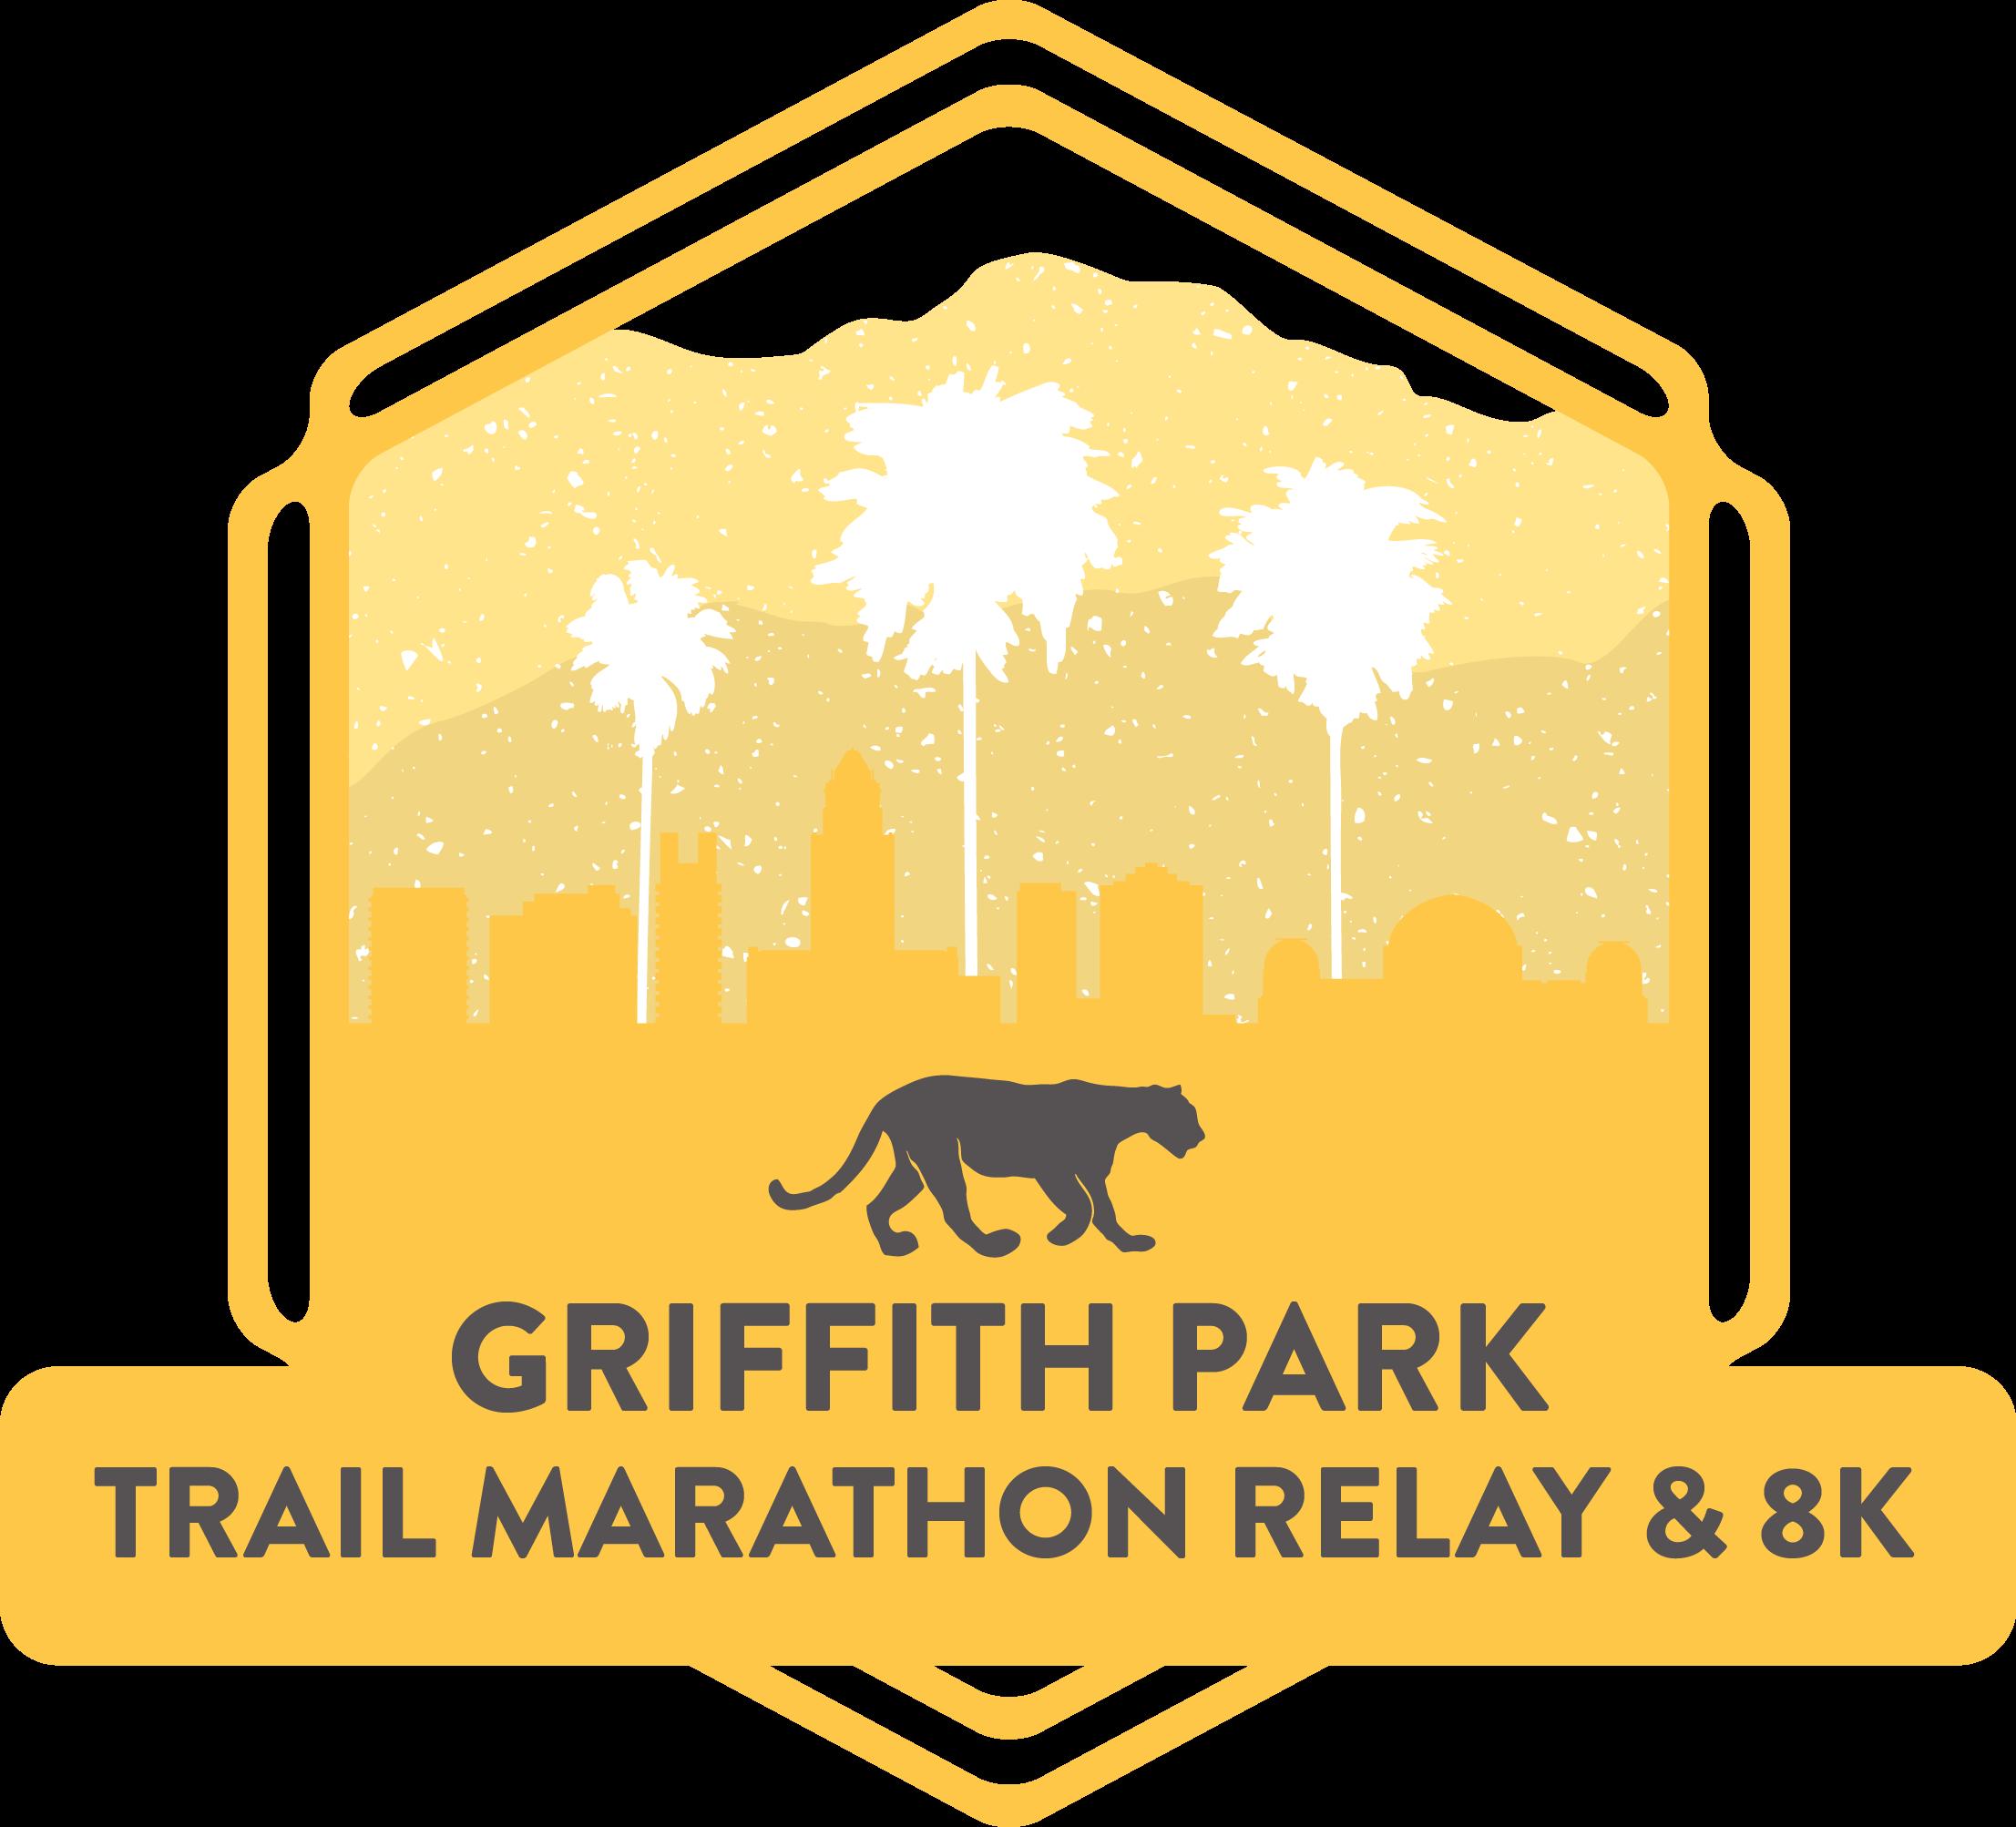 Griffith Park Trail Marathon Relay & 8K